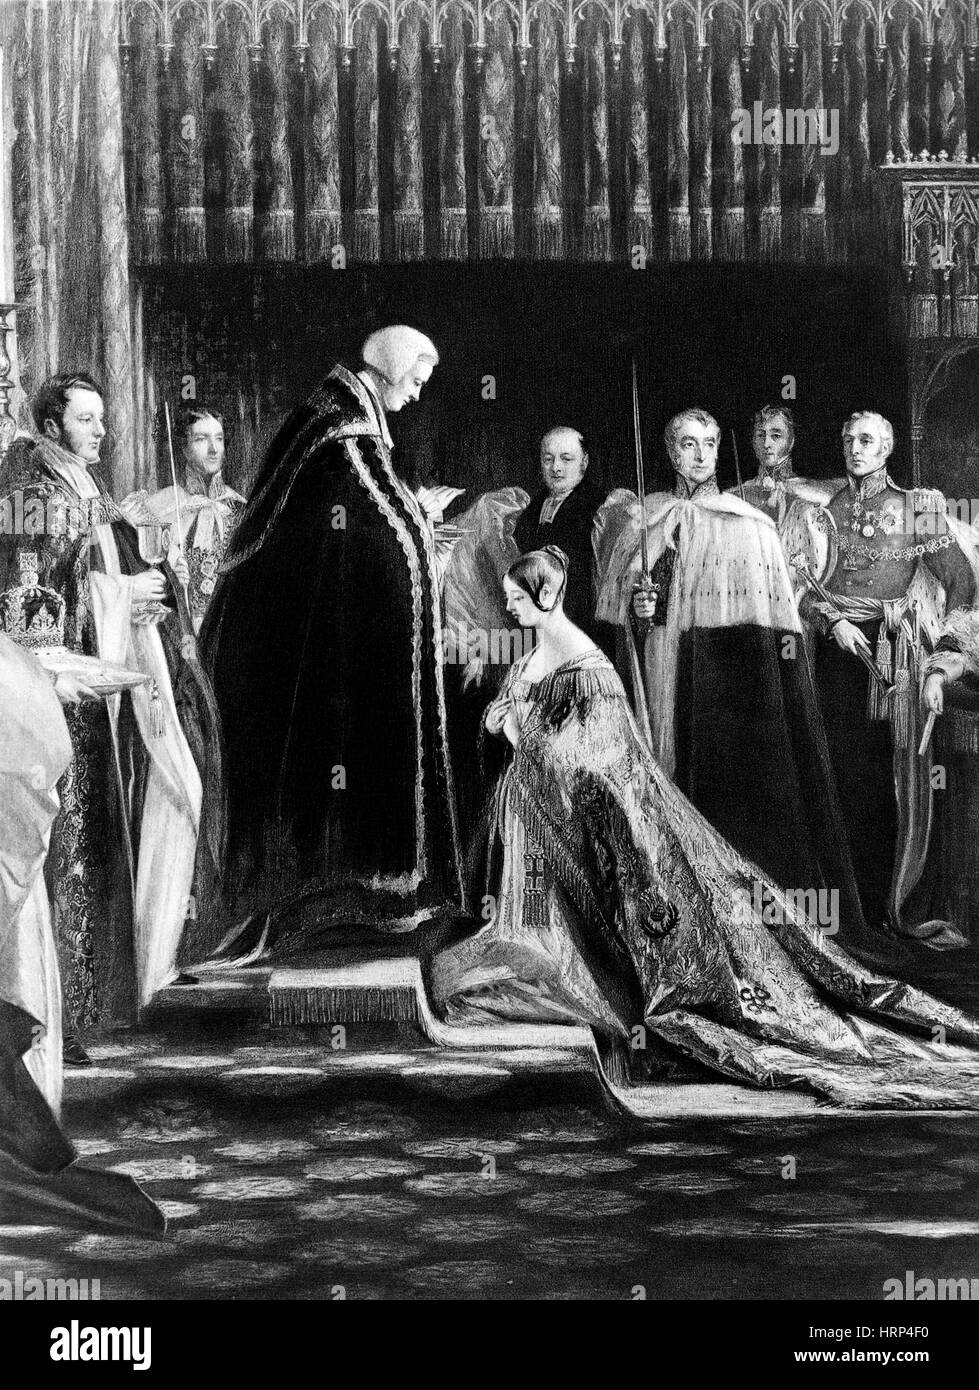 Queen Victoria, Coronation, 1838 - Stock Image